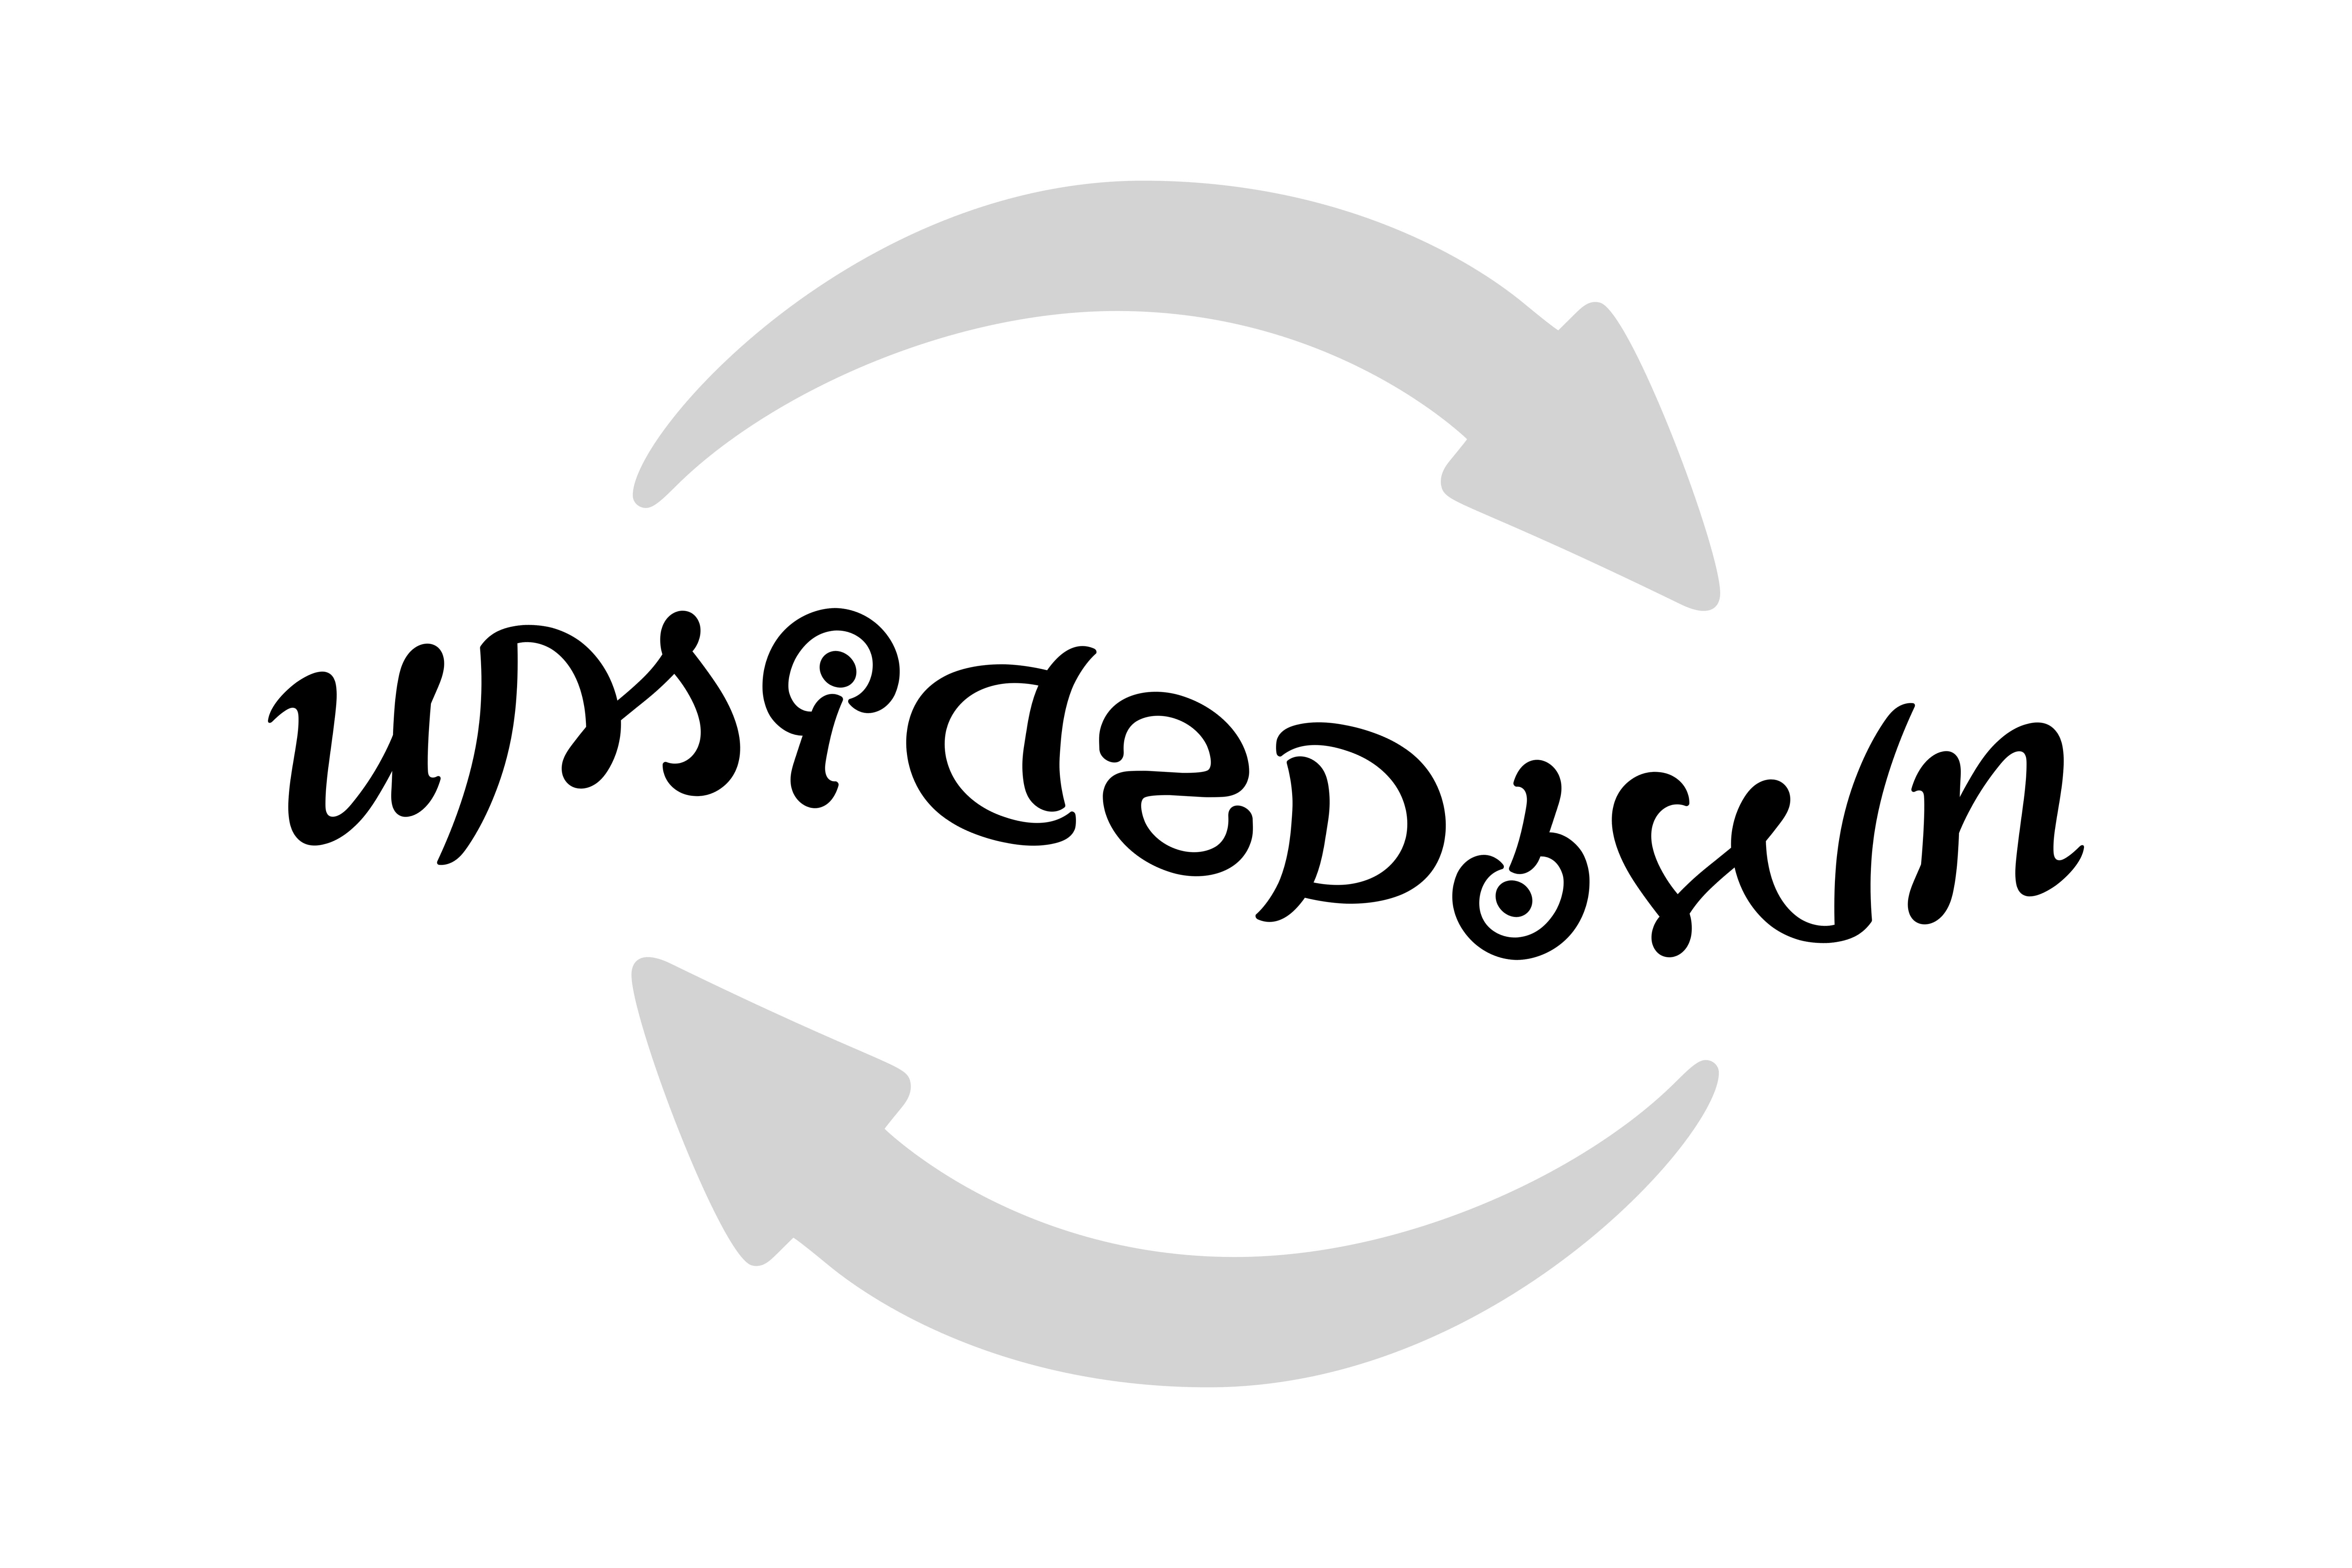 File:Ambigram Upside Down png - Wikimedia Commons